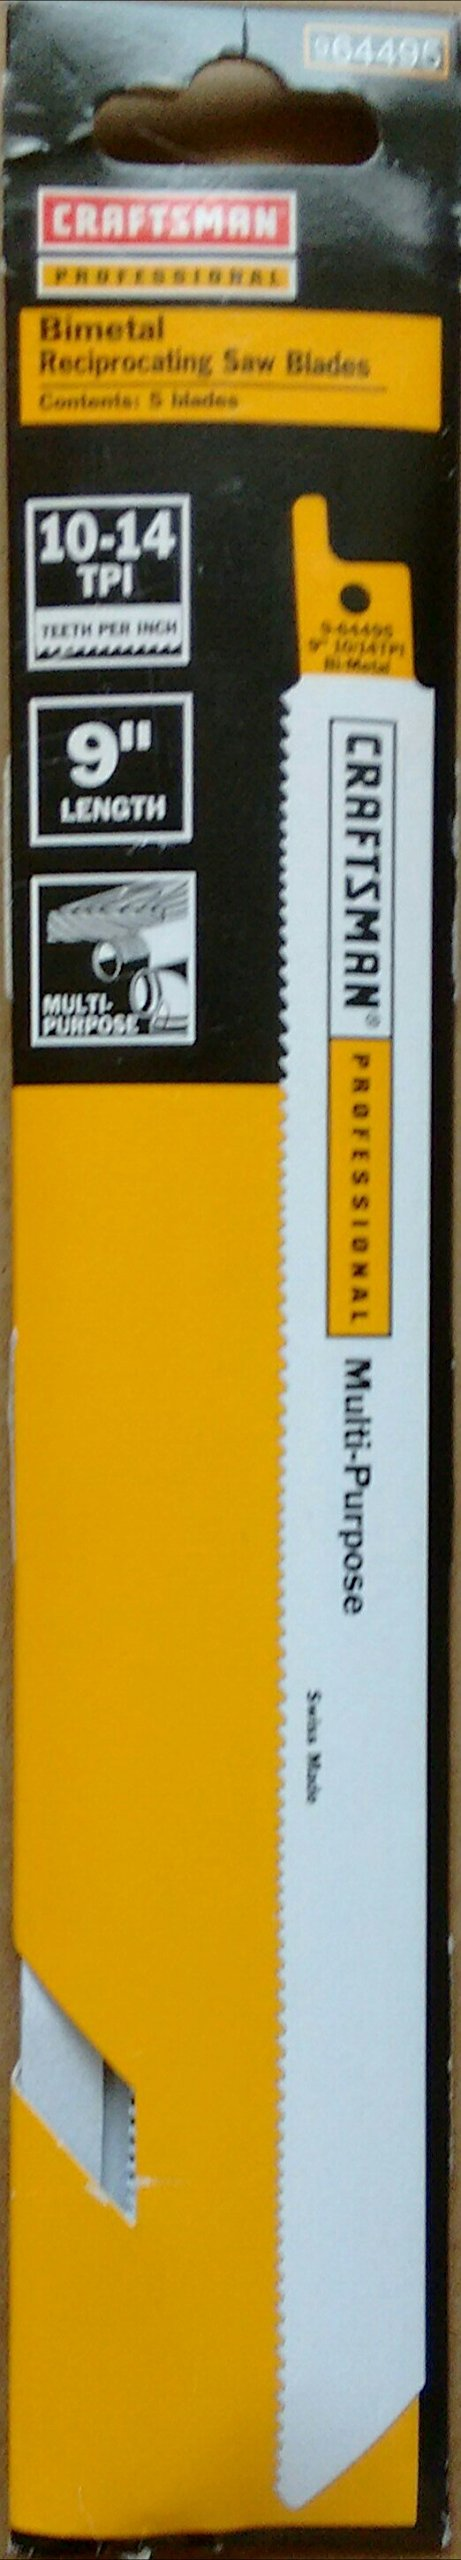 Craftsman Professional 9 in. 10-14 TPI Reciprocating Saw Blades 5 pc, multi purpose, Made in Switzerland 9-64495